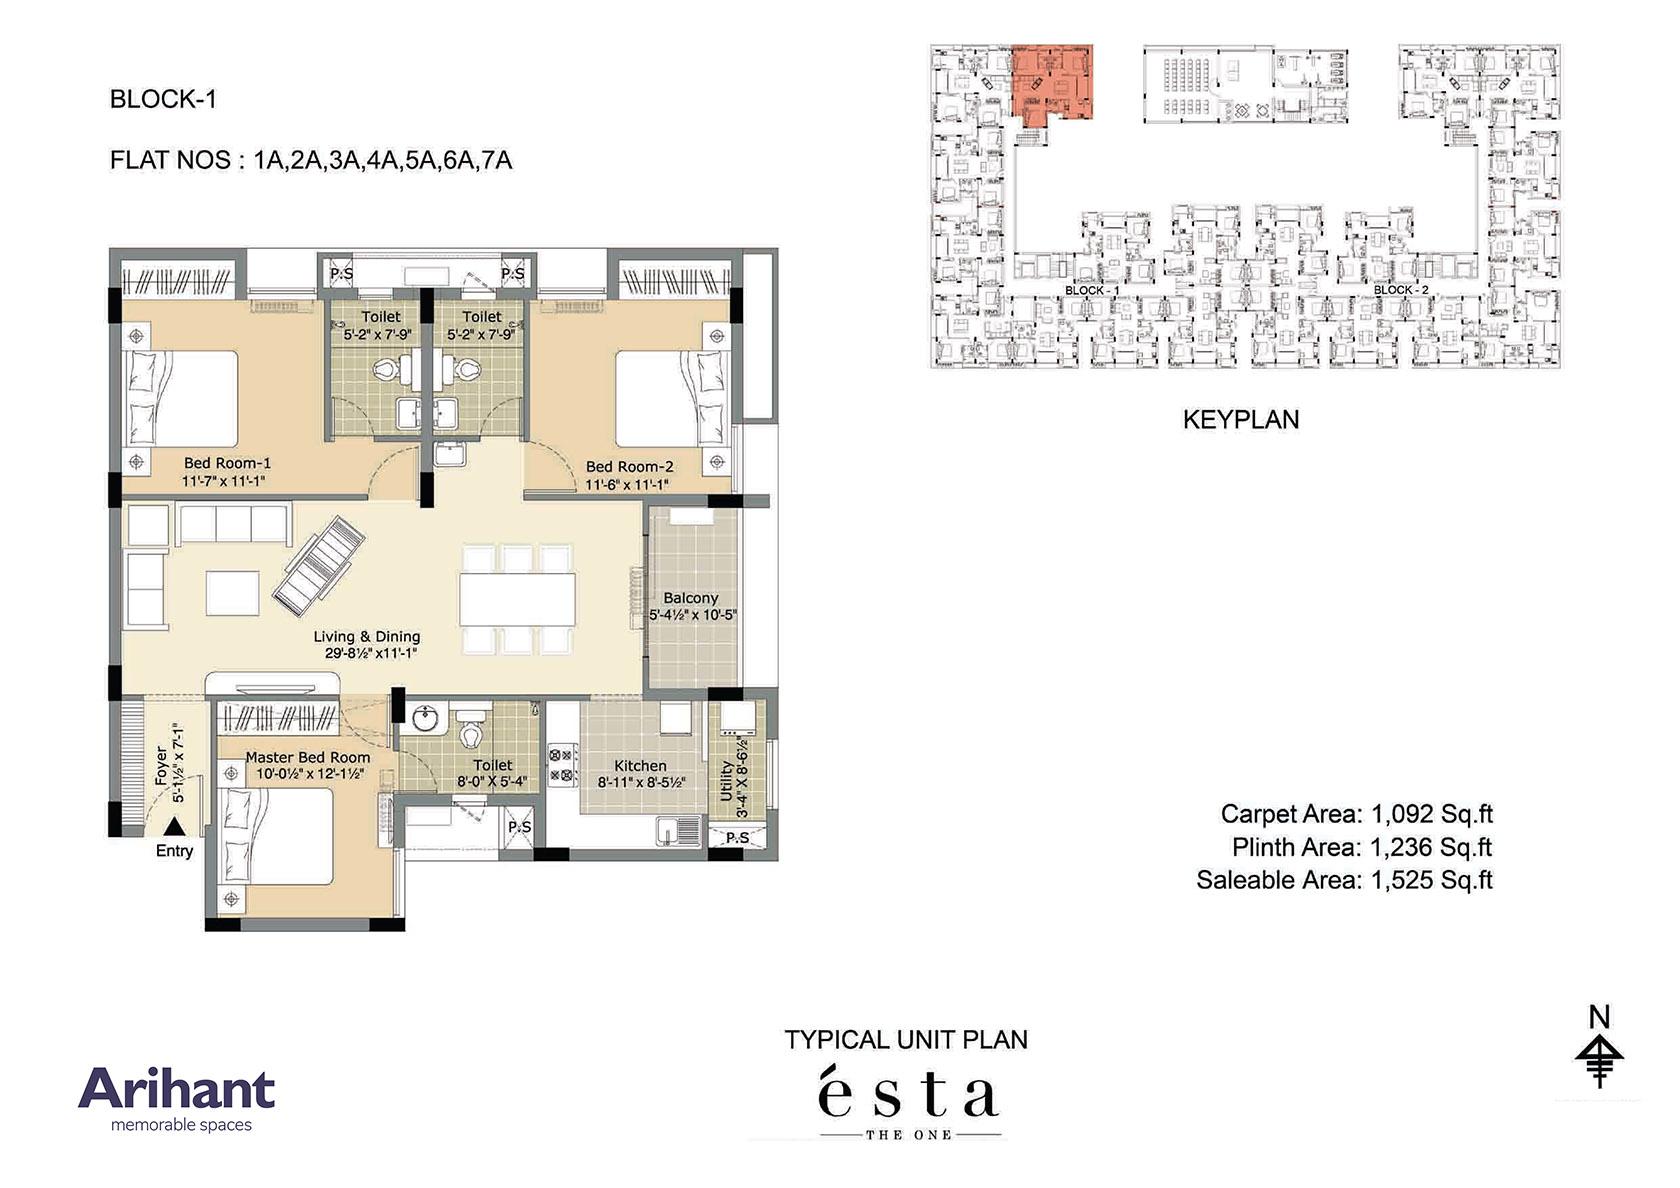 Arihant - Esta_Typical Unit Plan - Block 1 - Type A